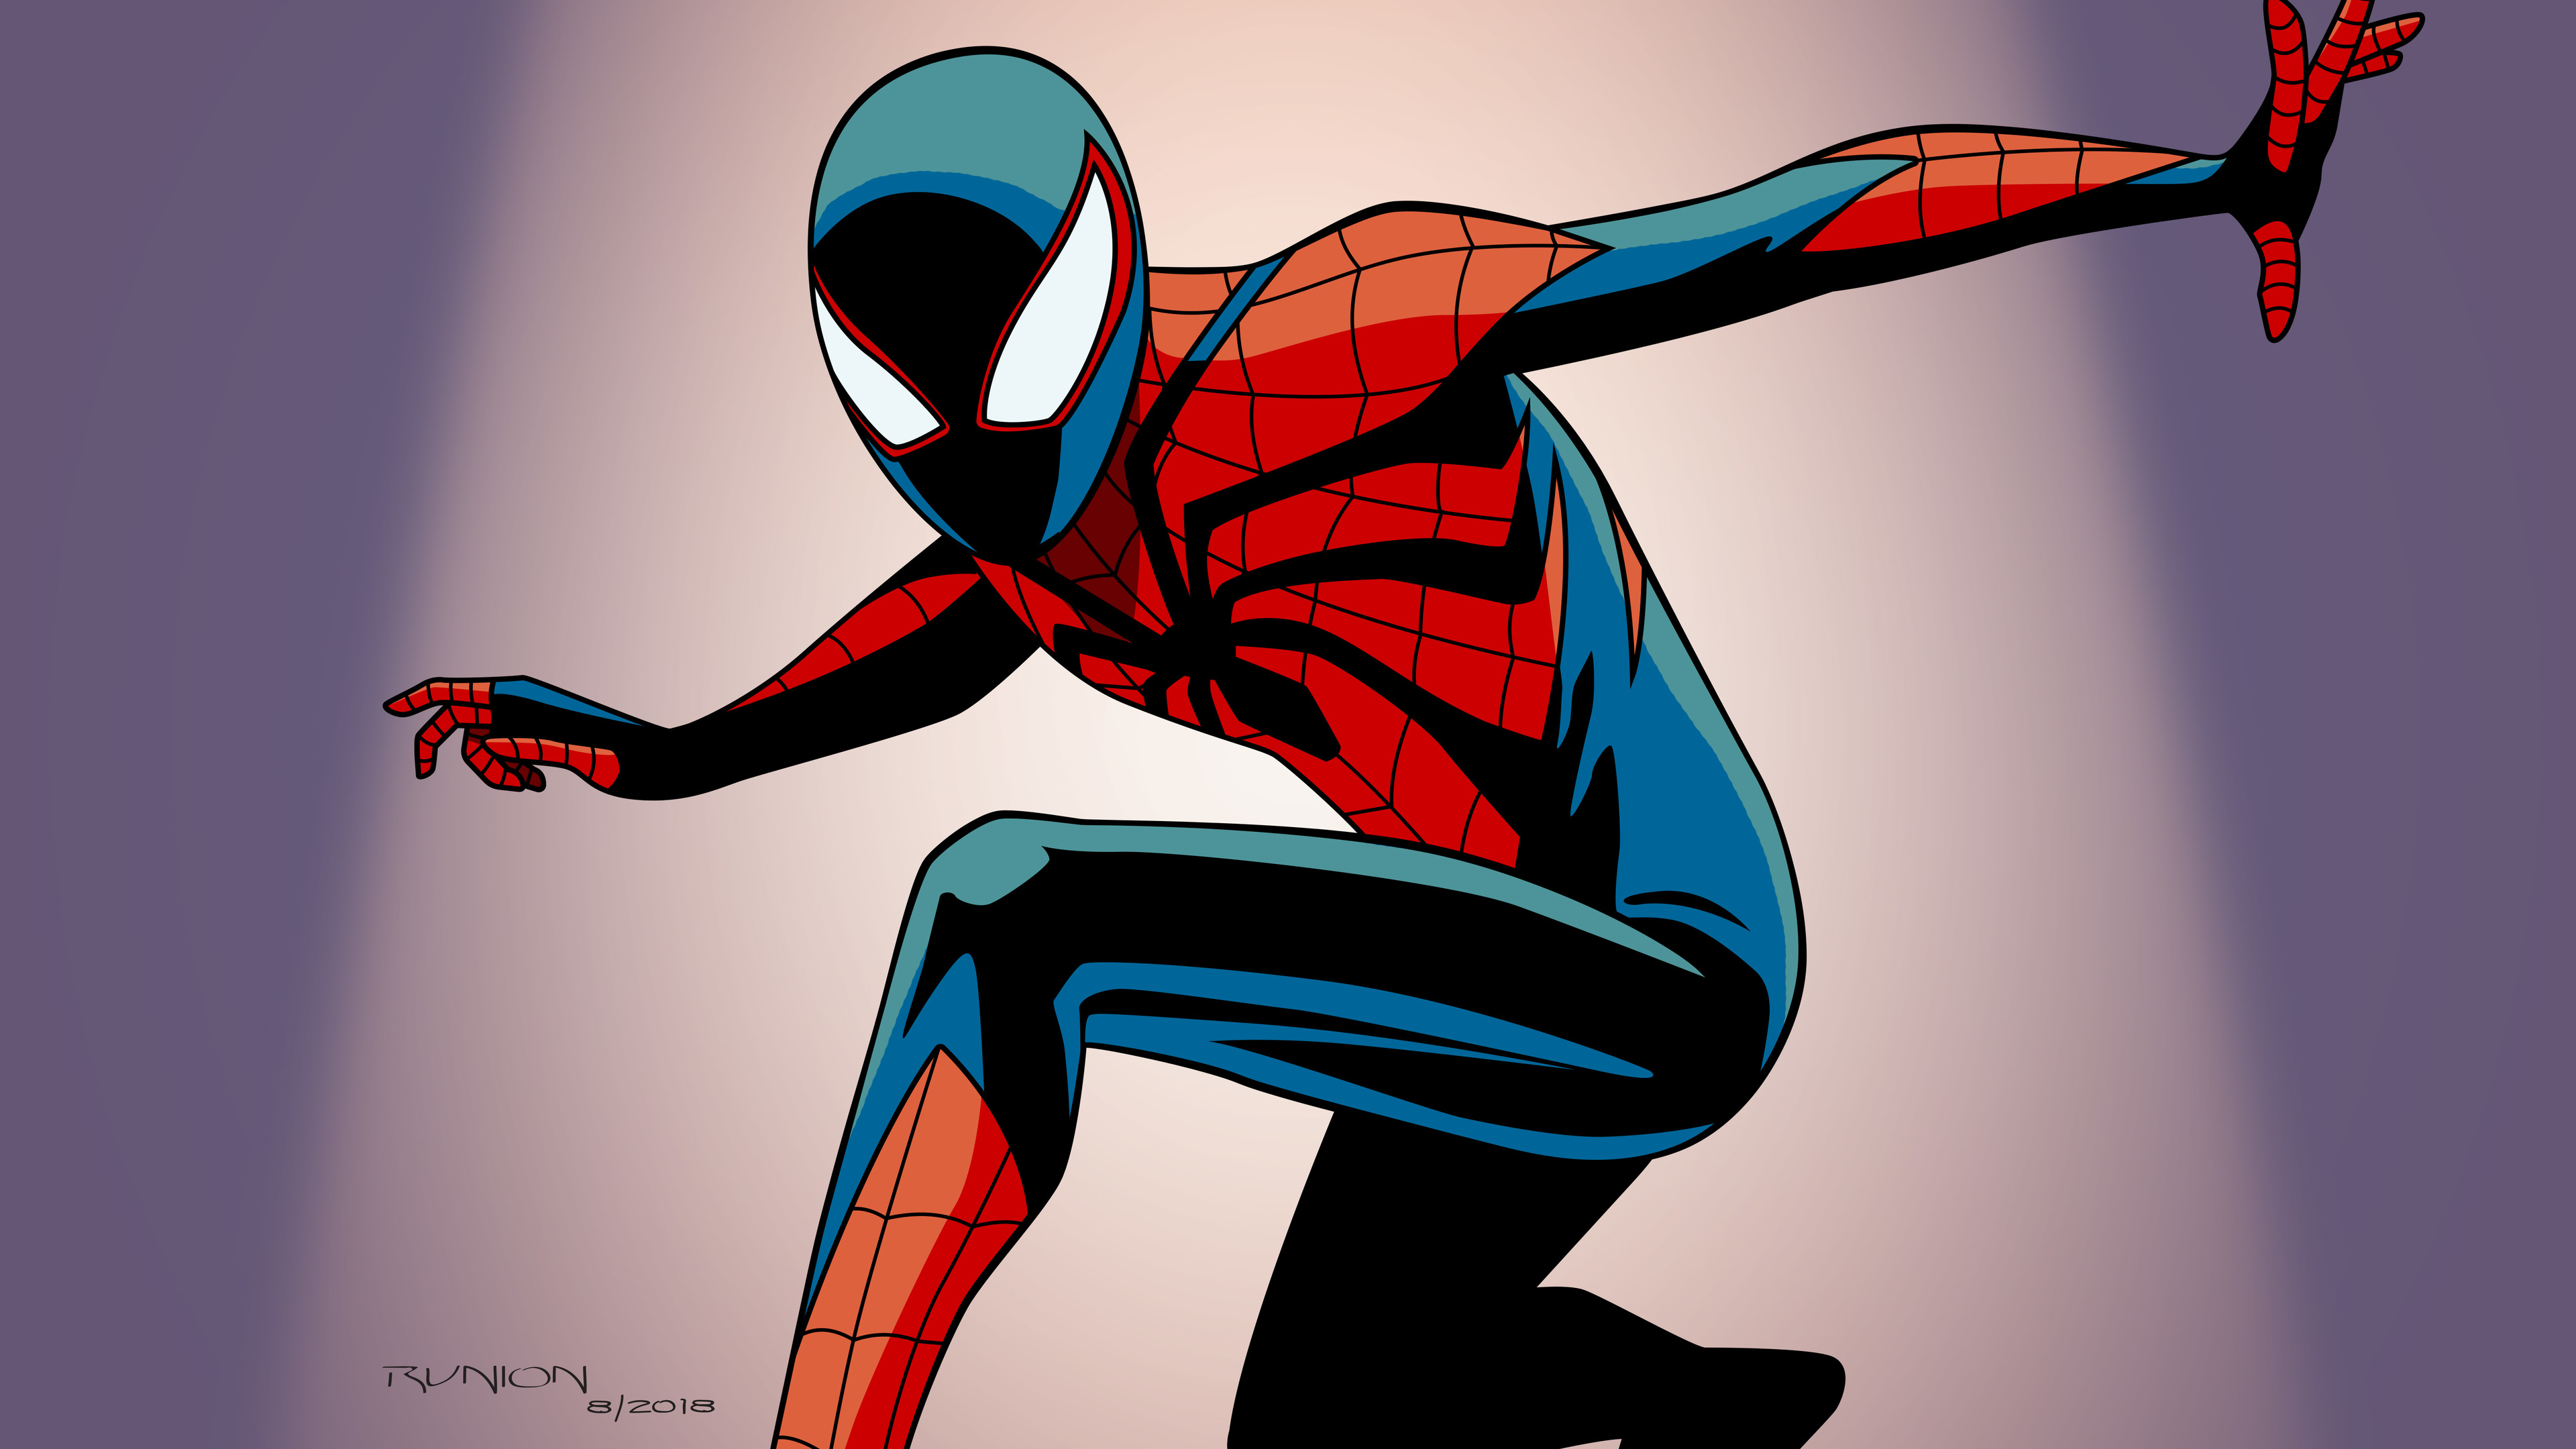 spider man 2026 1543619986 - Spider Man 2026 - superheroes wallpapers, spiderman wallpapers, hd-wallpapers, deviantart wallpapers, artwork wallpapers, artist wallpapers, 4k-wallpapers